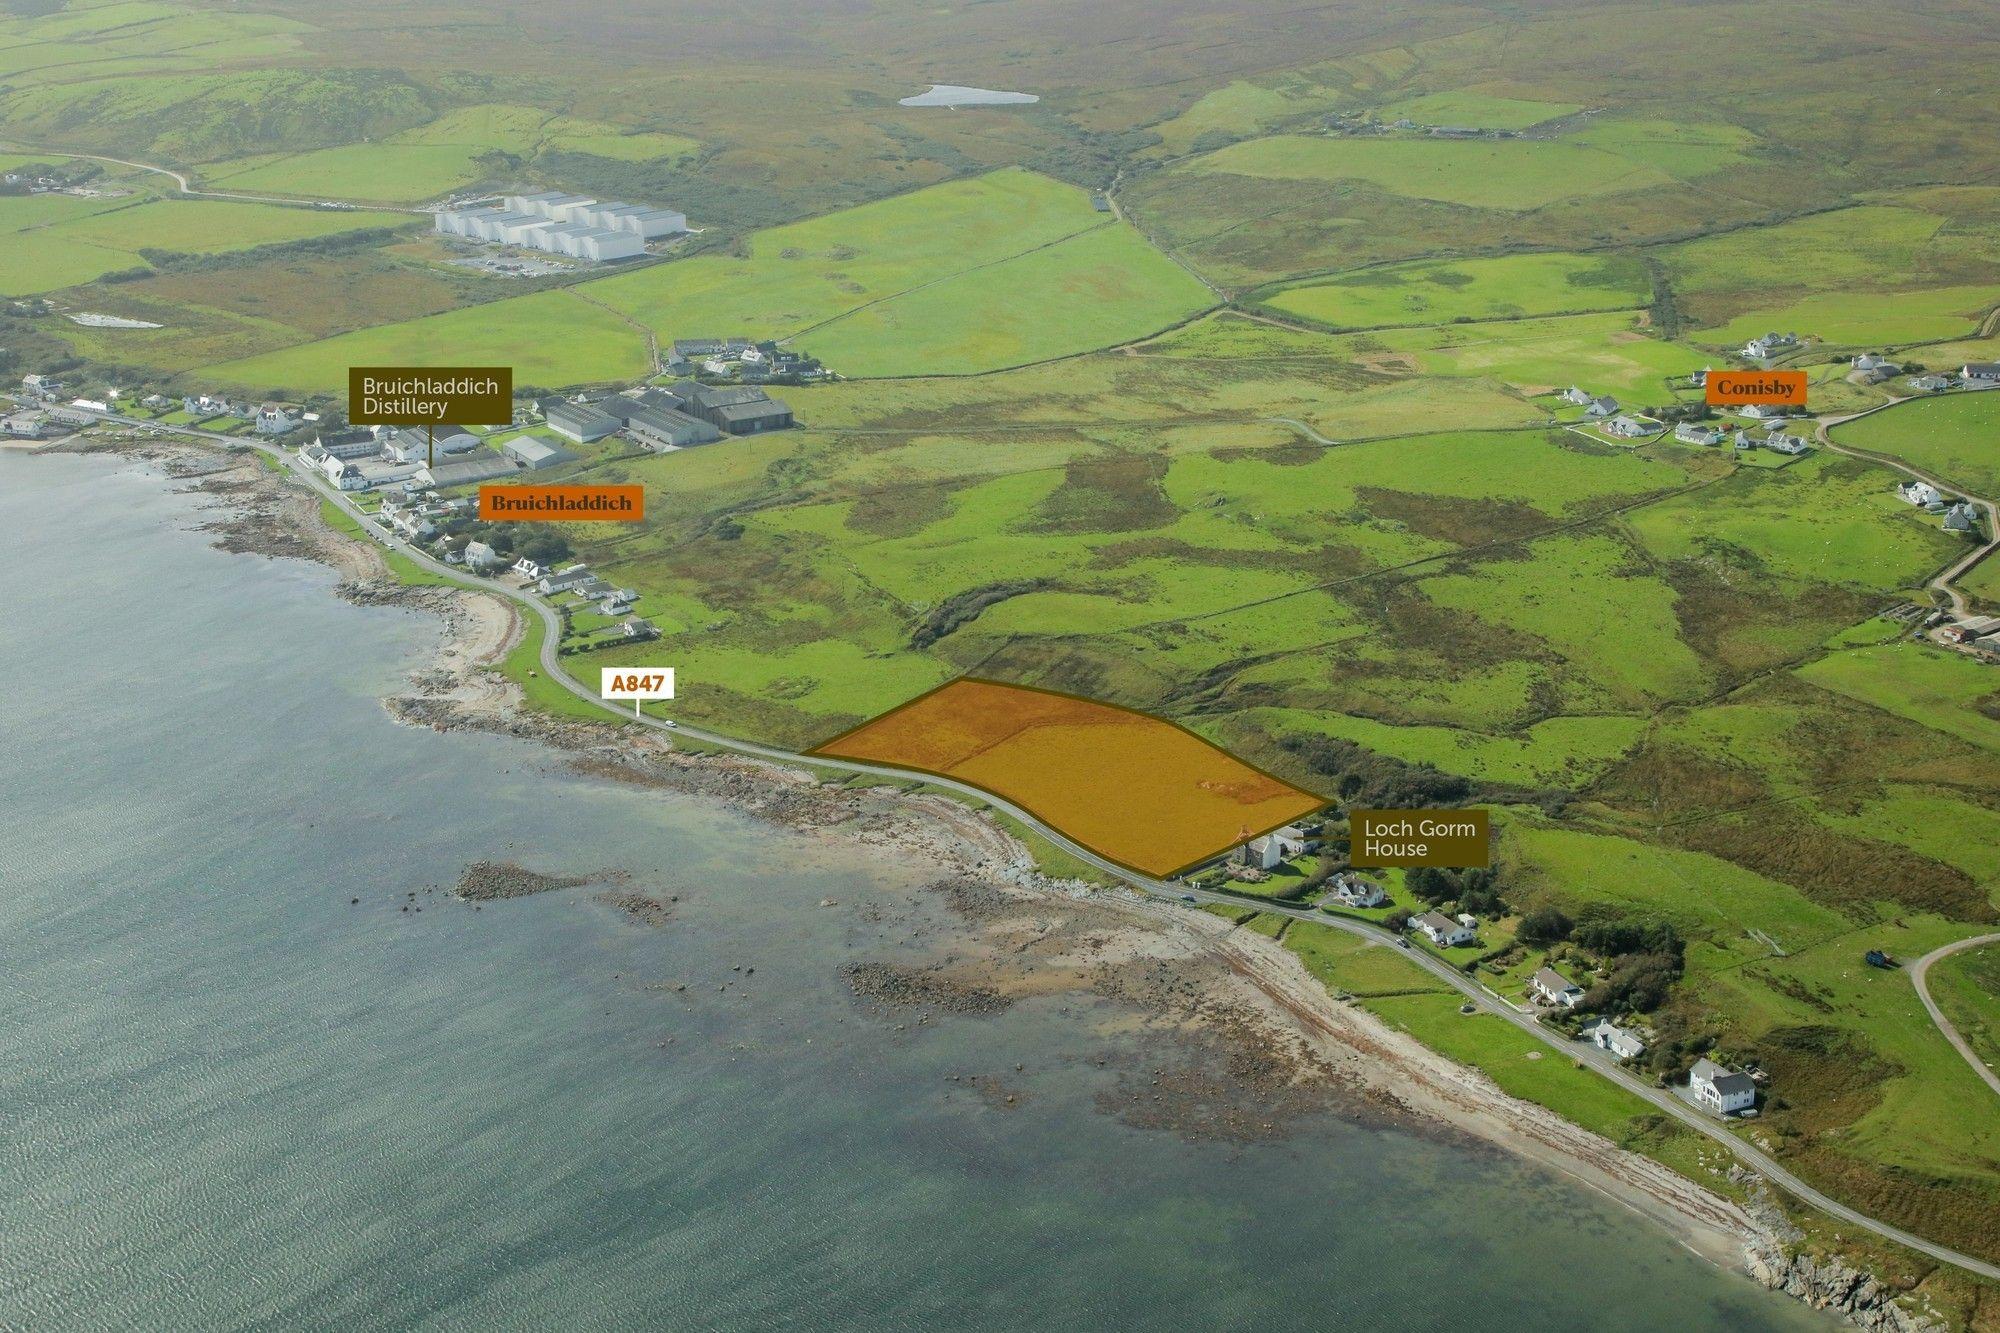 Property photo 1 of 5. Land West Of Loch Gorm House, Bruichladdich, Isle Of Islay Pa49 7Un